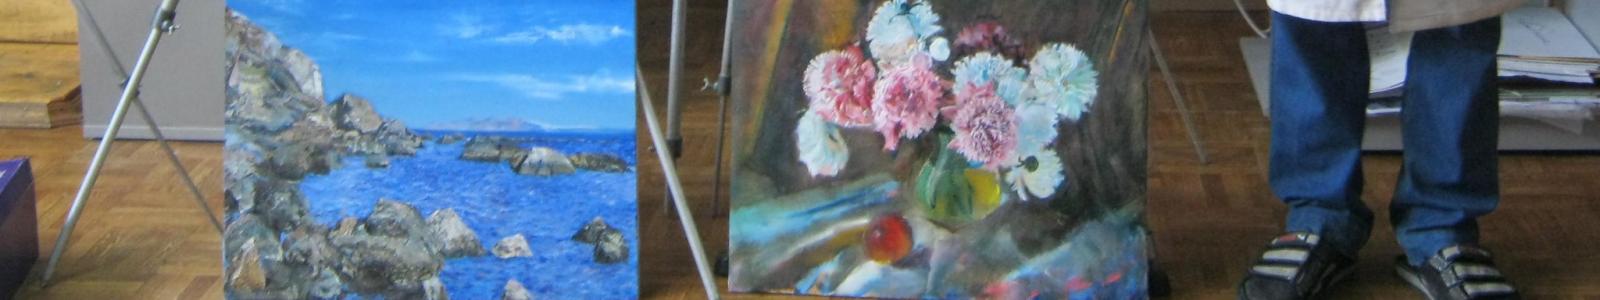 Gallery Painter Artyom Ukhov